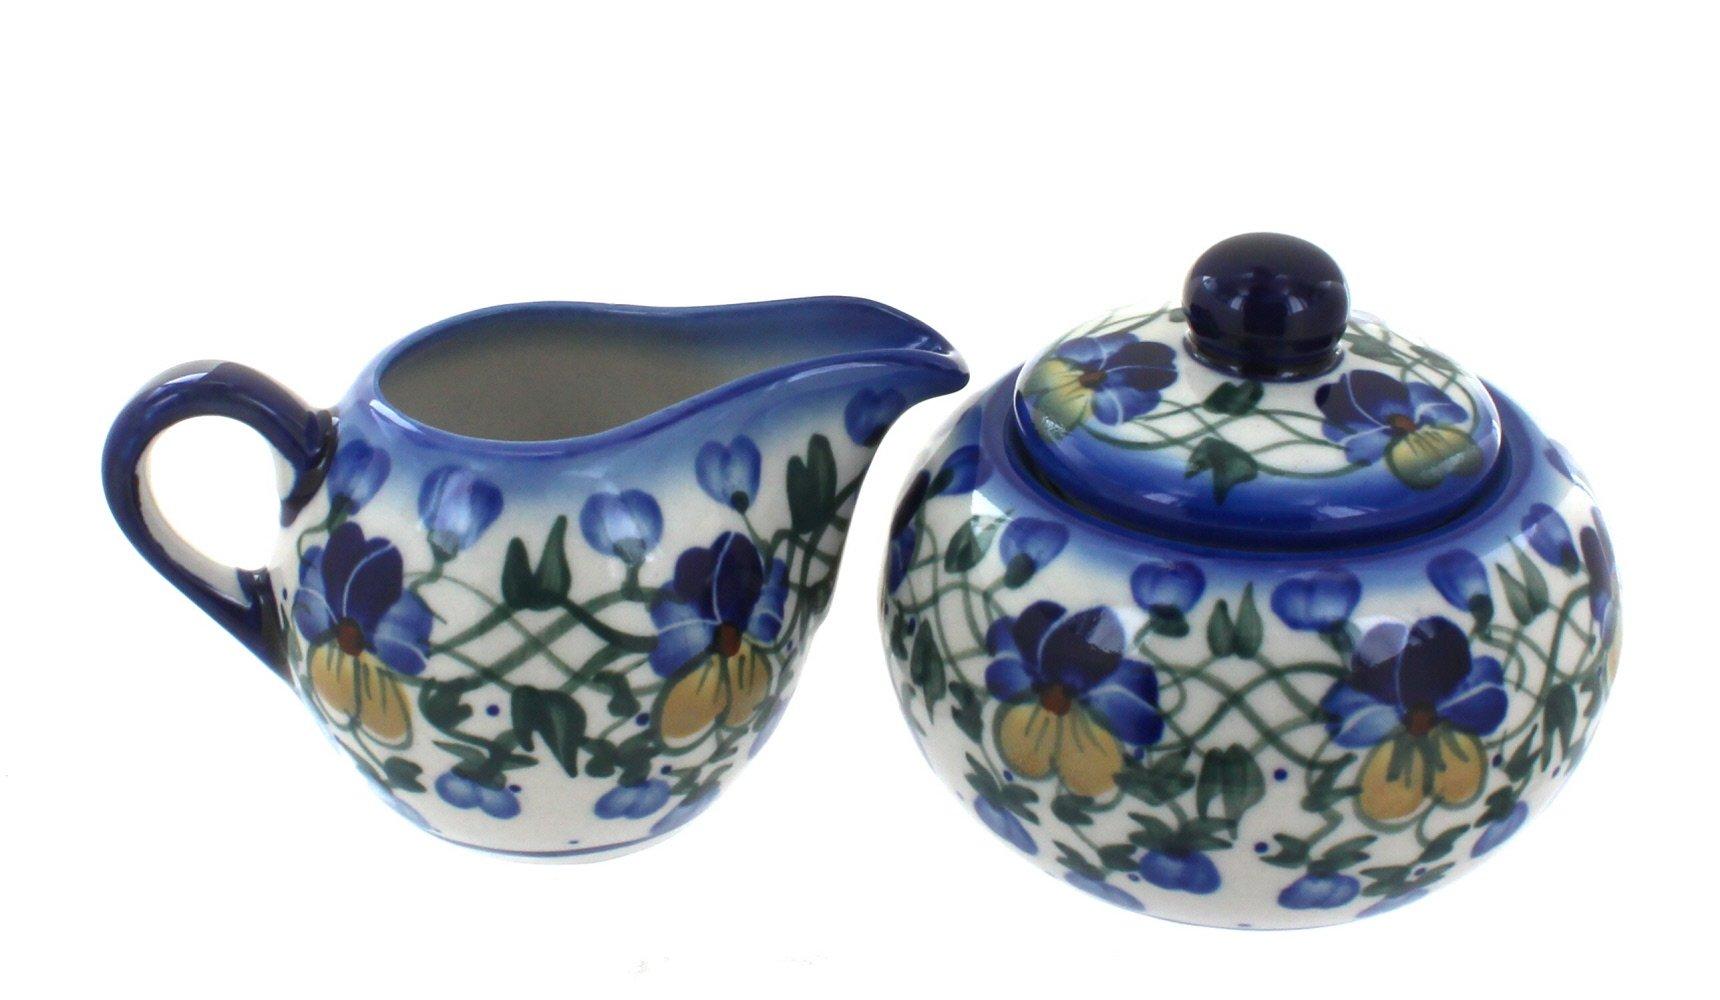 Blue Rose Polish Pottery Pansies Sugar Bowl & Creamer